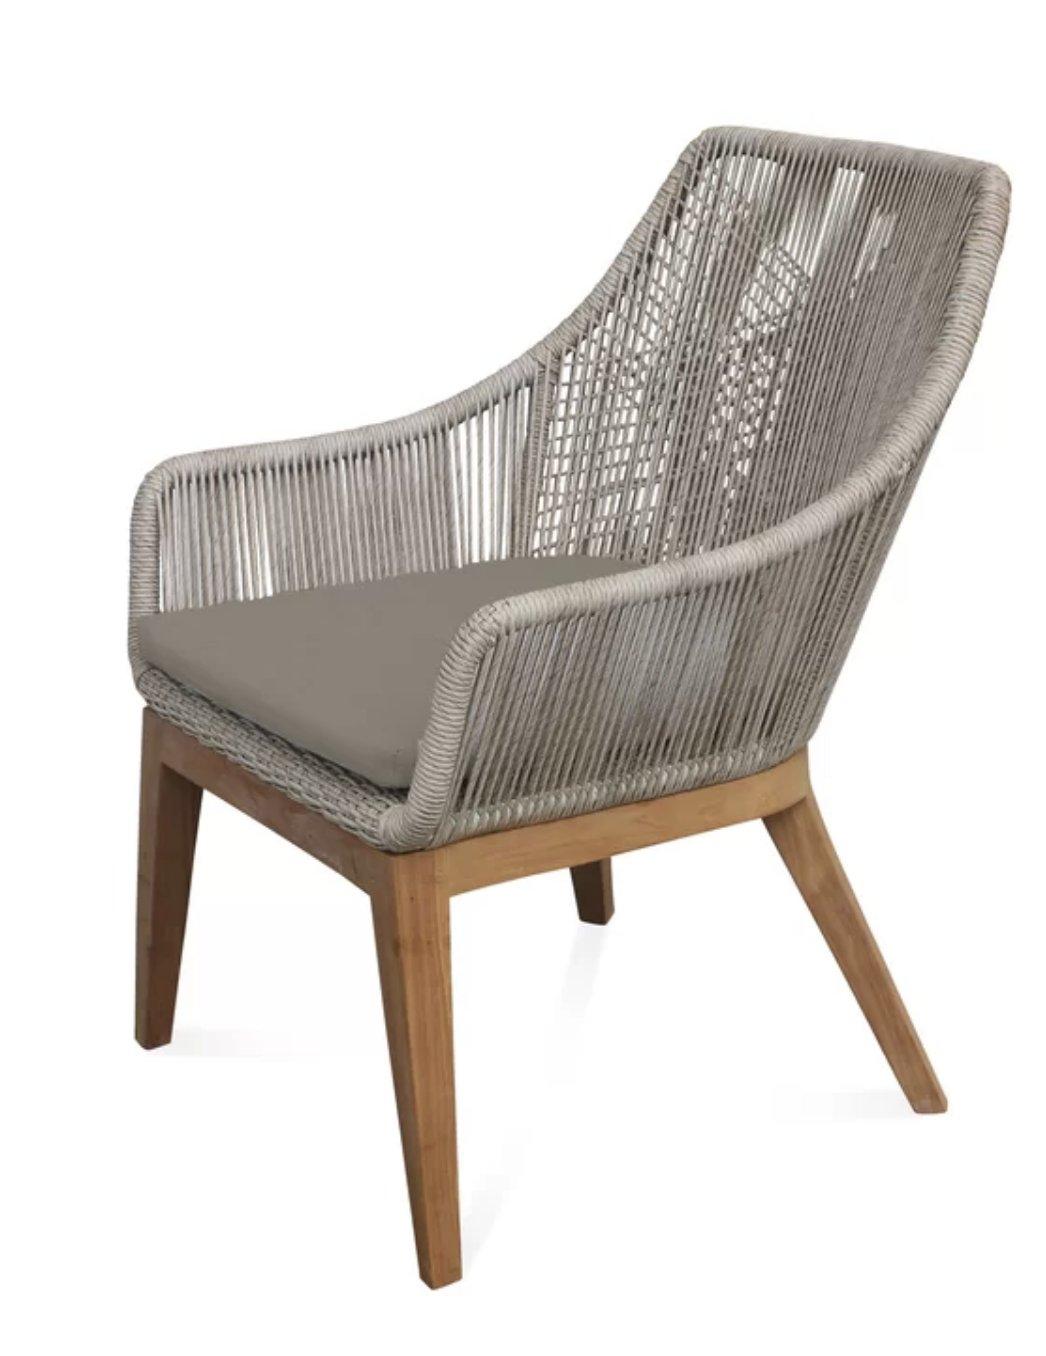 Judith Teak Patio Chair with Cushion